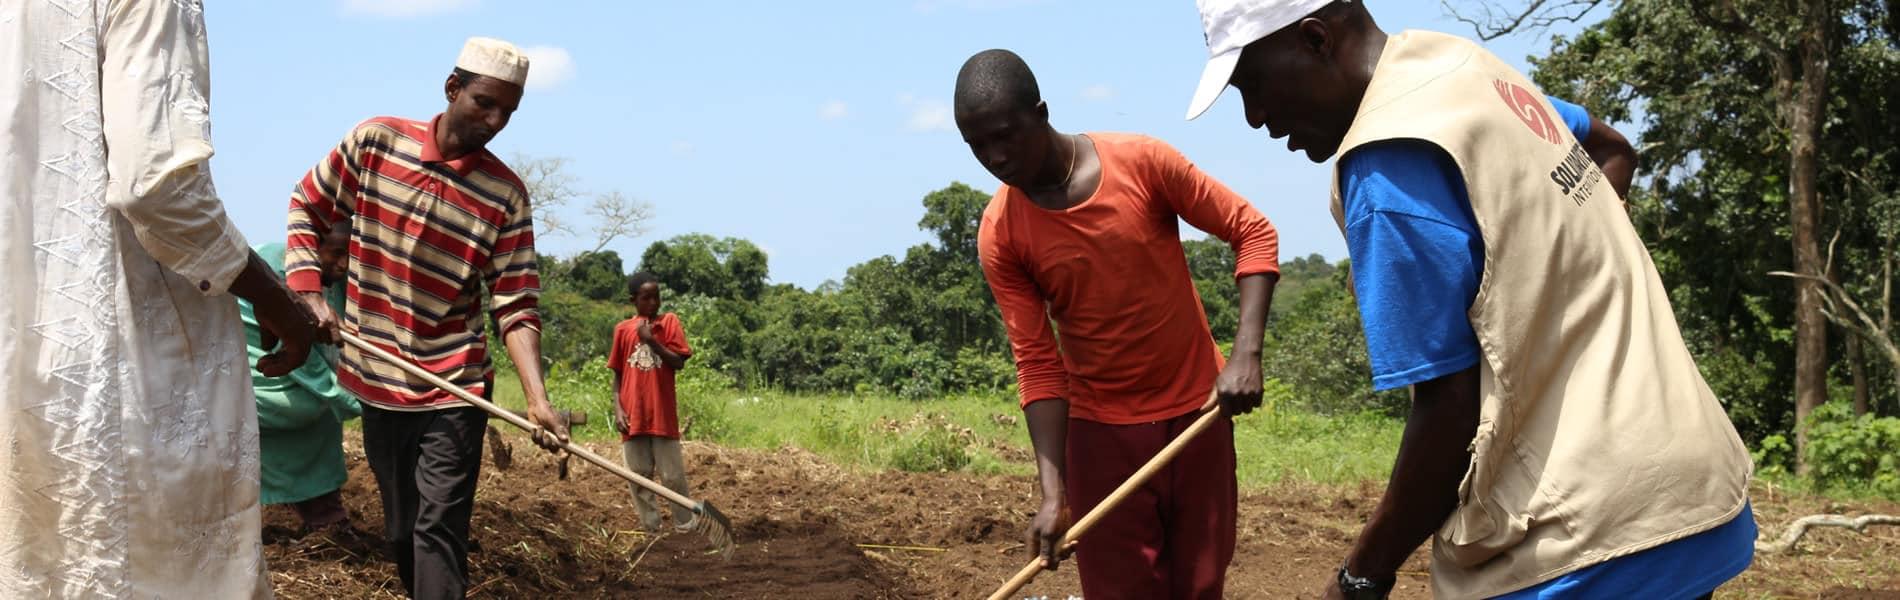 Sécurité alimentaire Cameroun